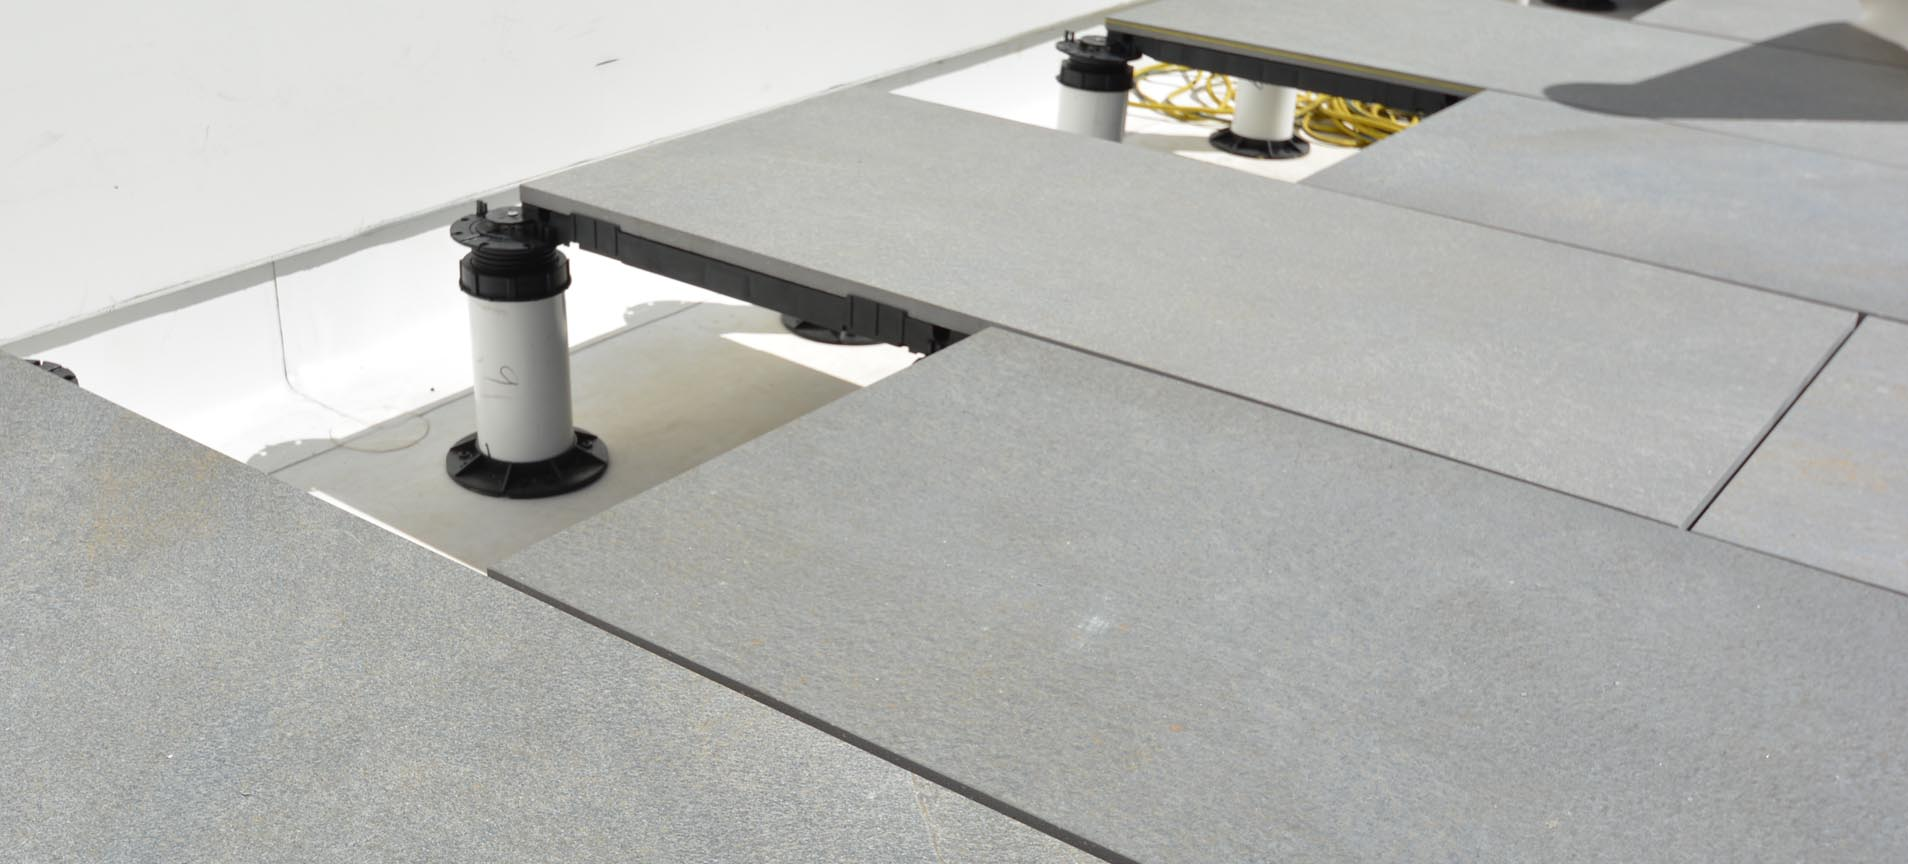 What Makes Tile Tech's Adjustable Pedestal System the Best?